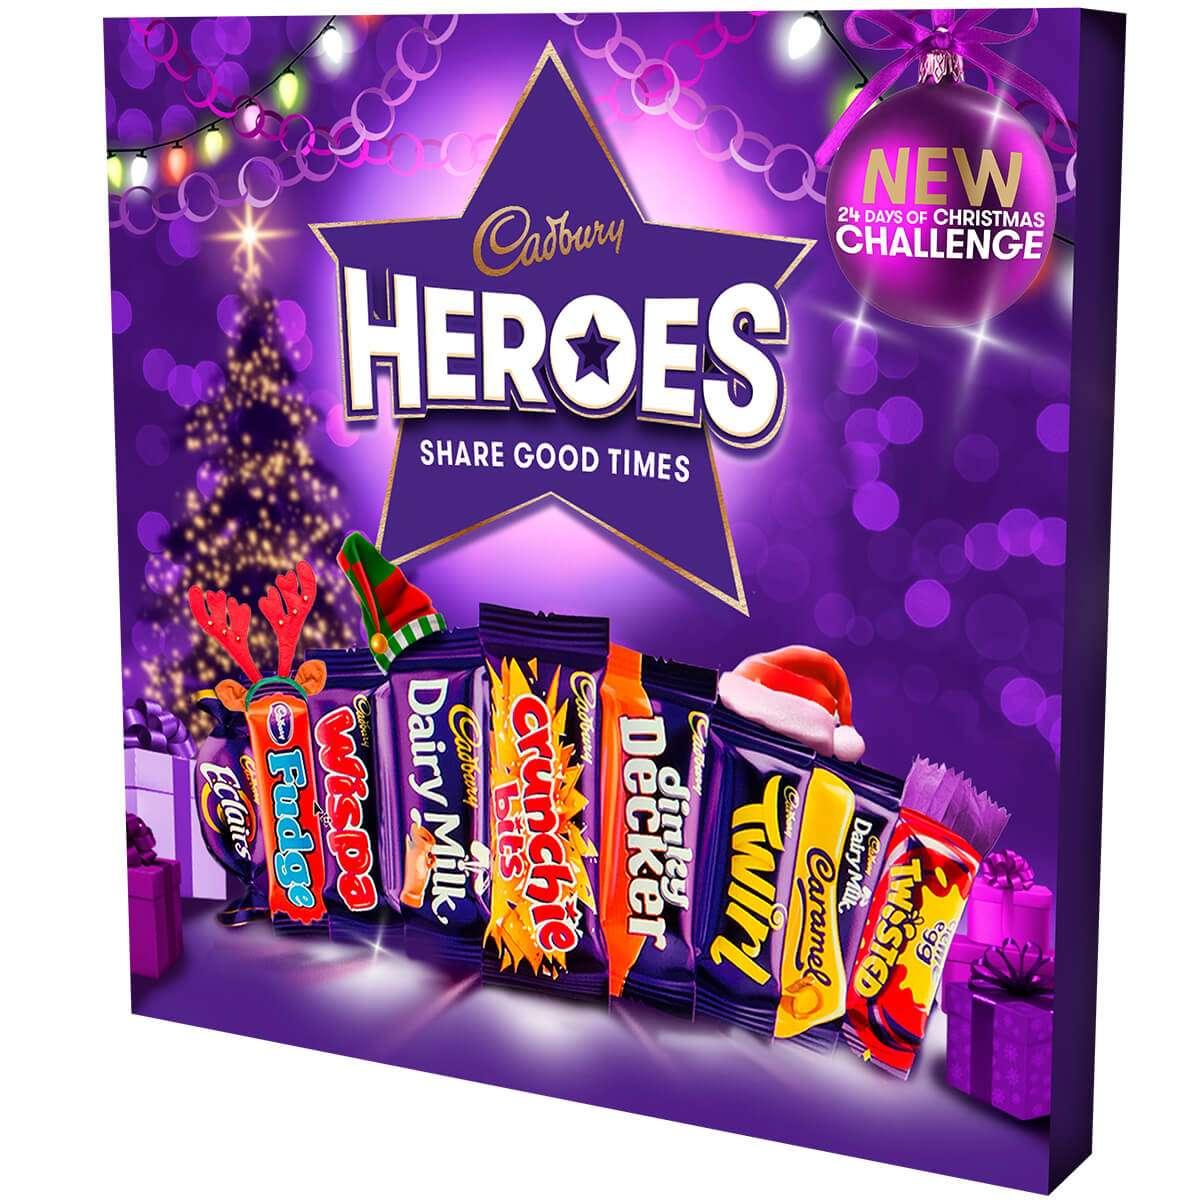 cadbury heroes gift box